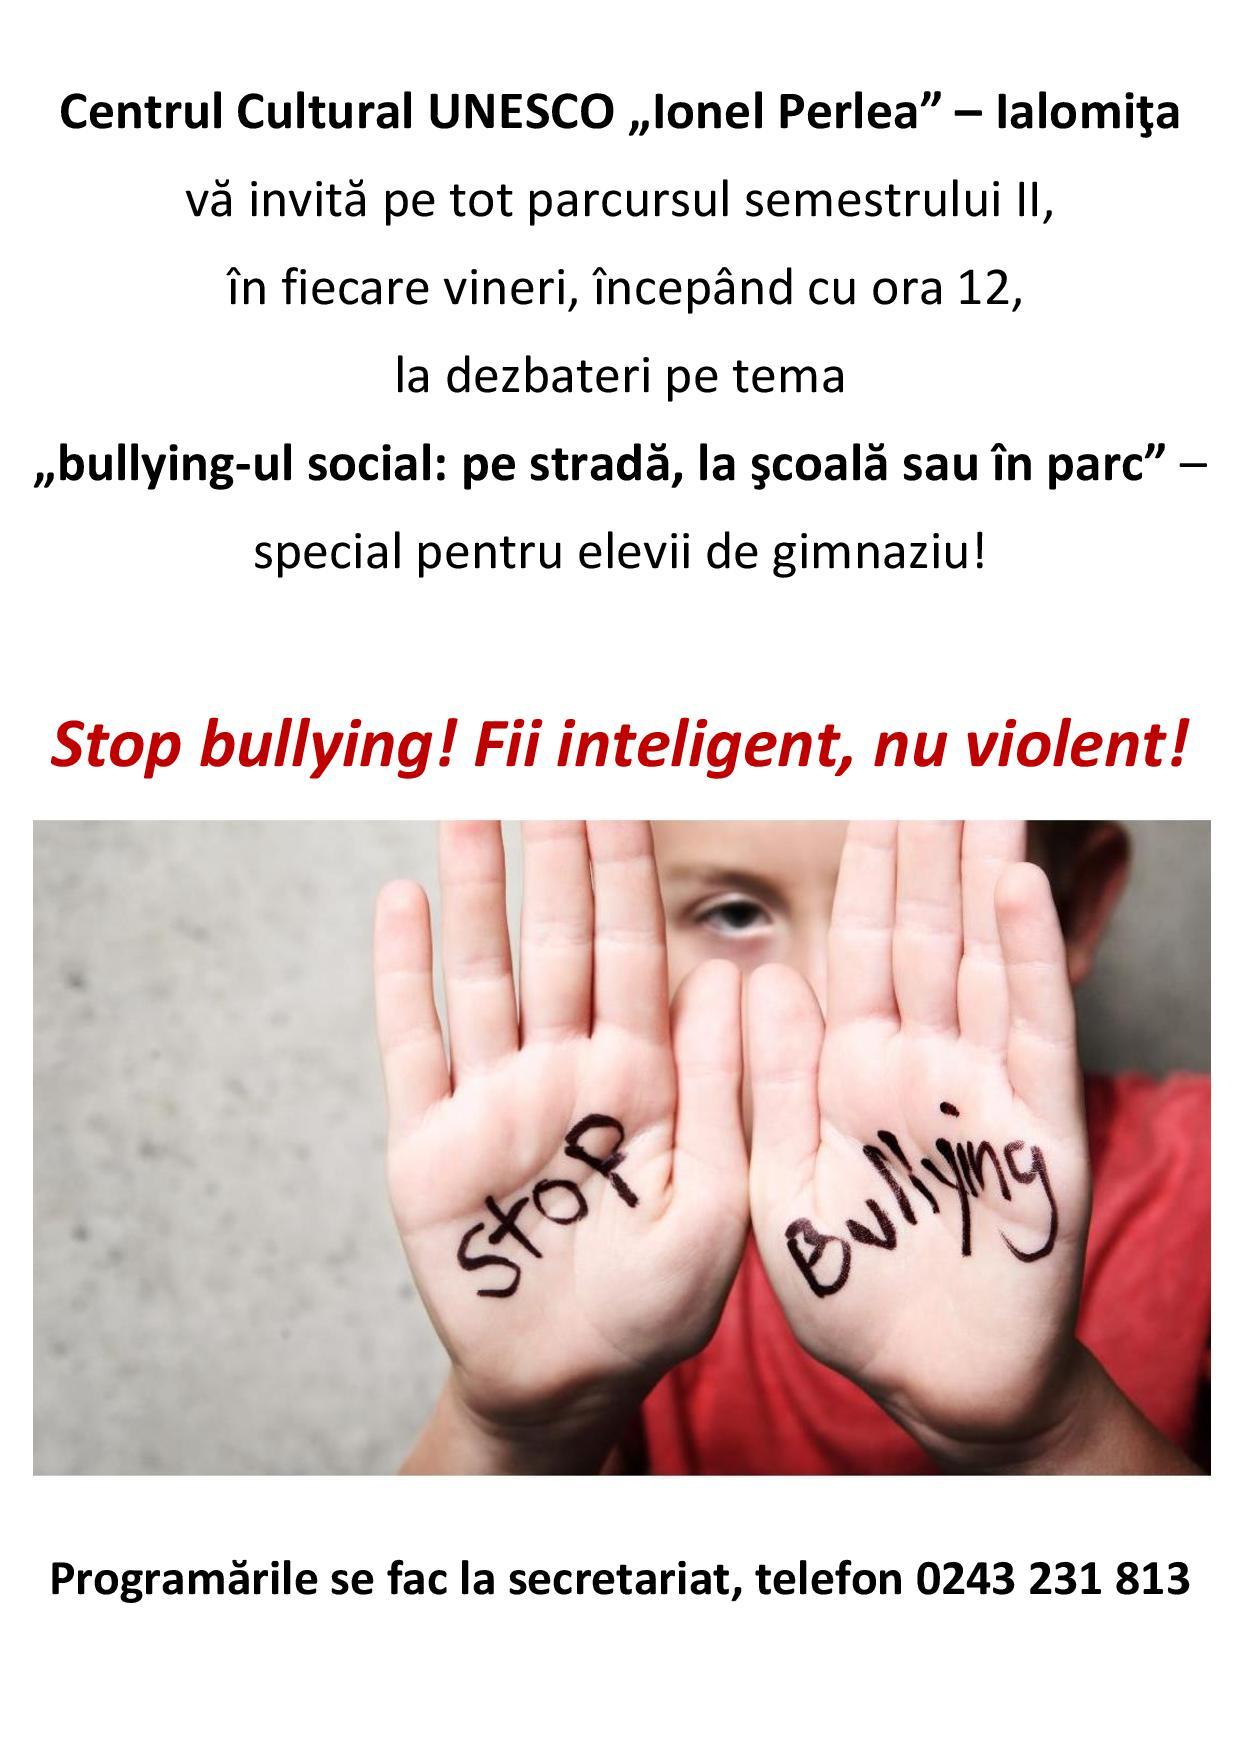 Stop bullying! Fii inteligent, nu violent!